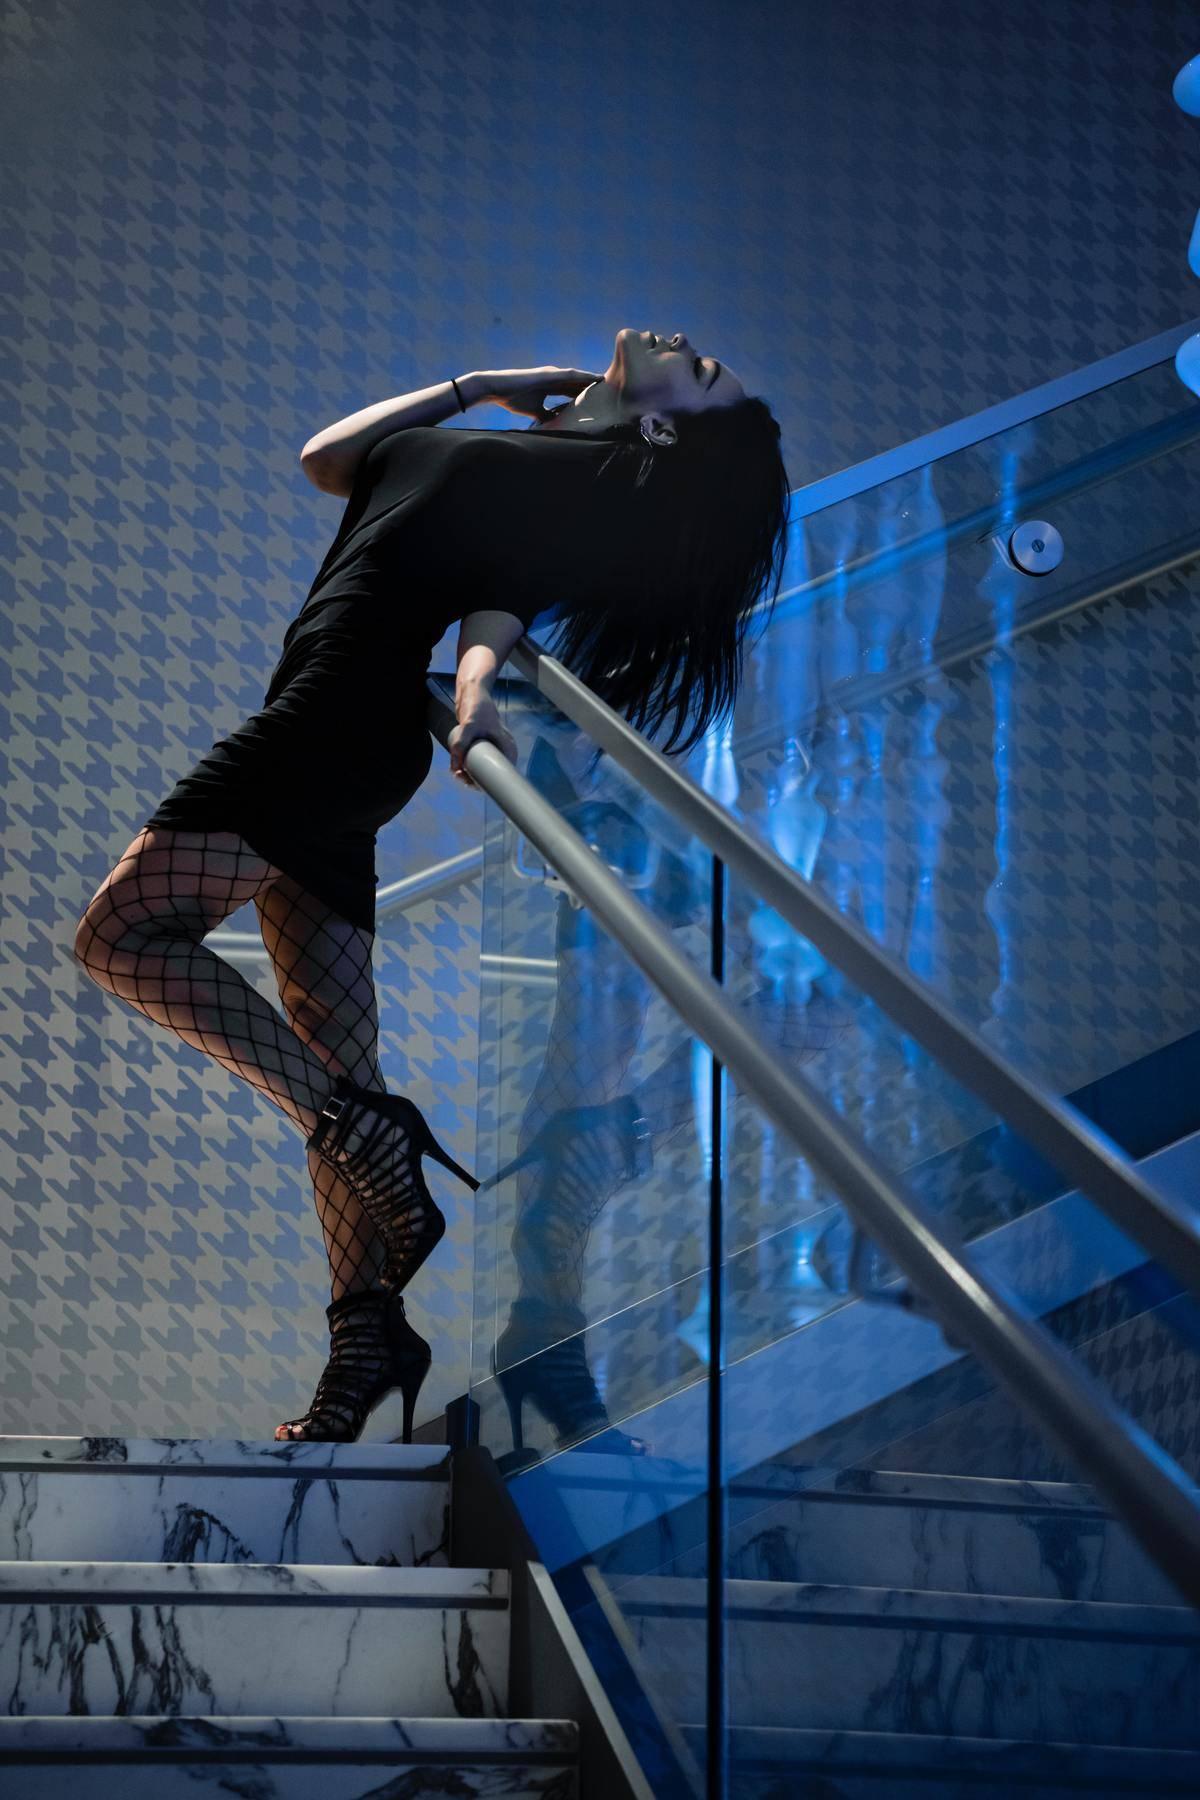 woman in stockings leaning against stairway in blue lighting